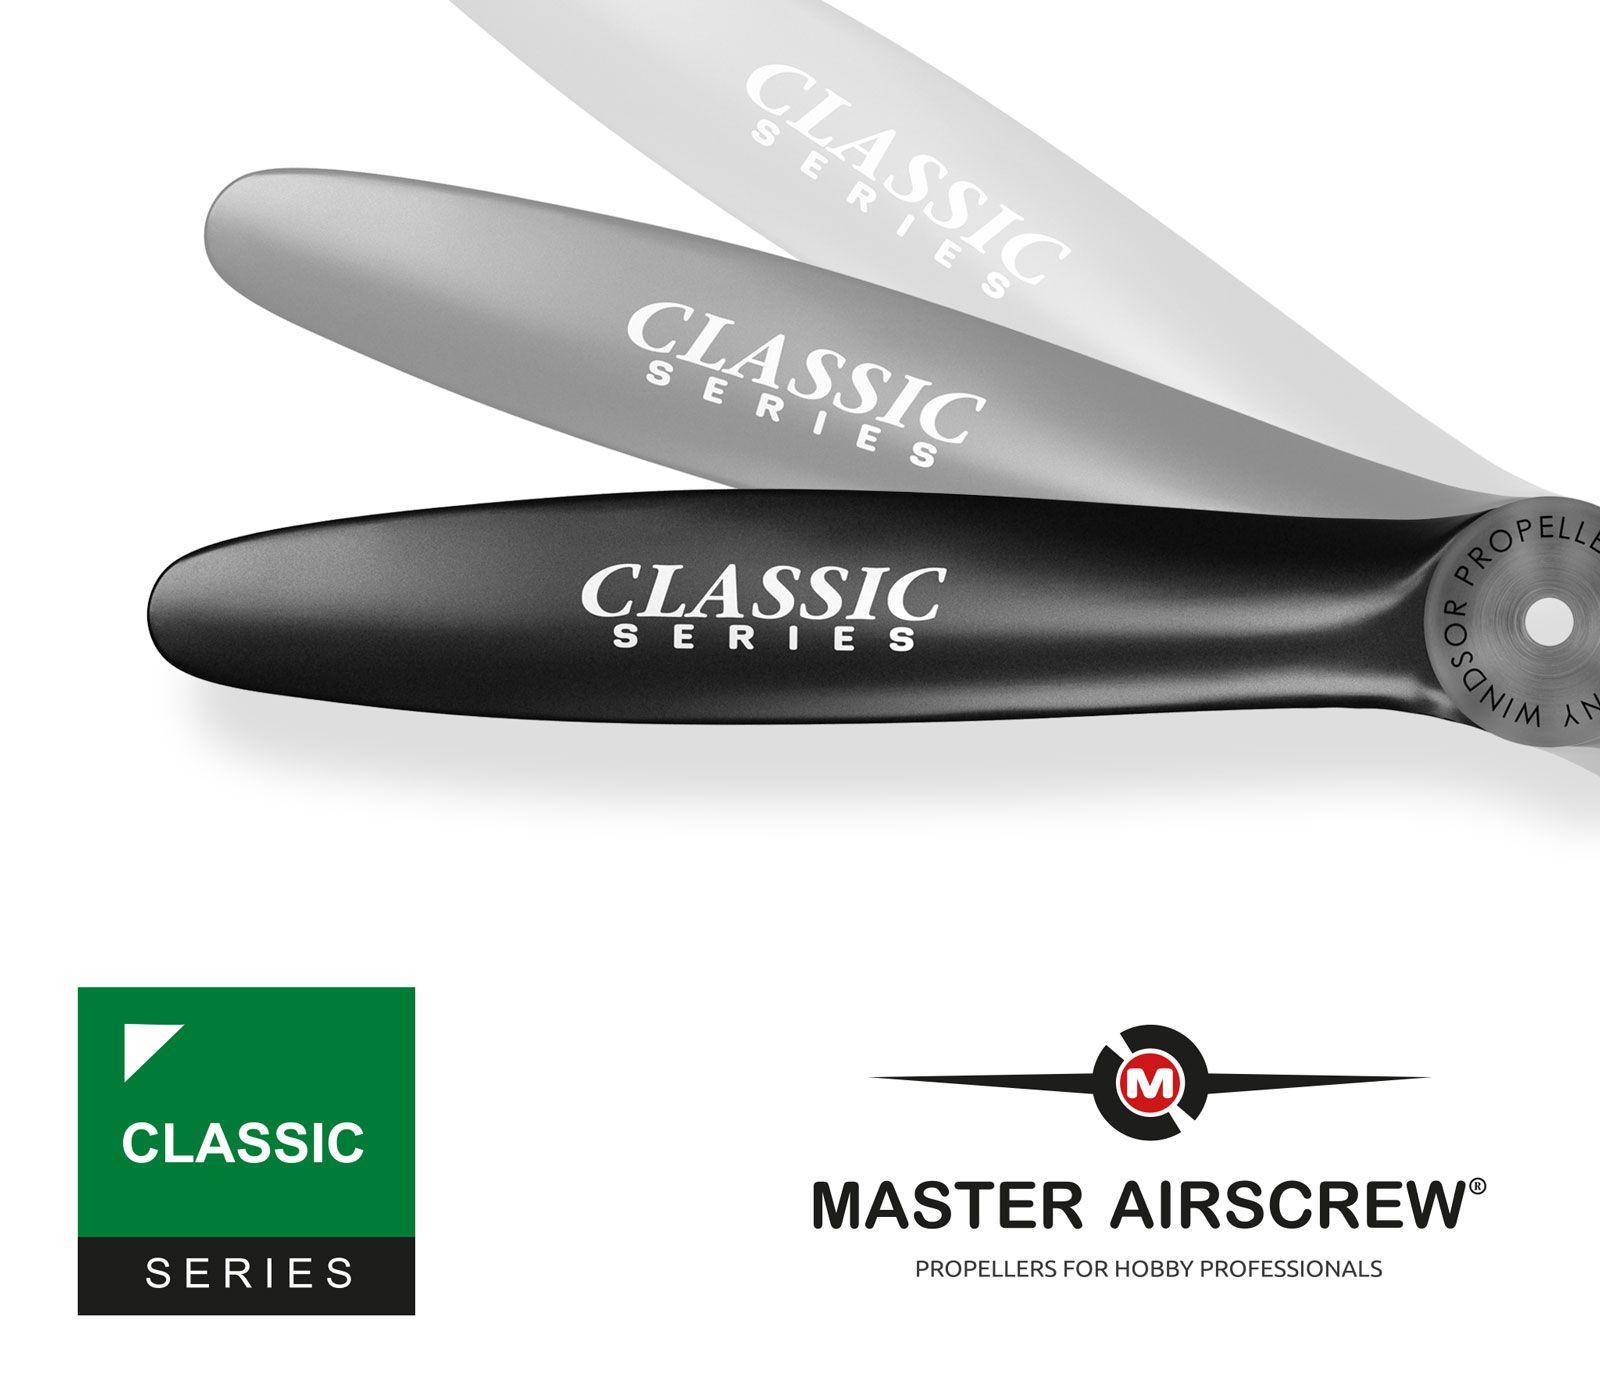 Hélice Para Aeromodelos A Combustão Master Airscrew 18X8-Série Classic  - King Models